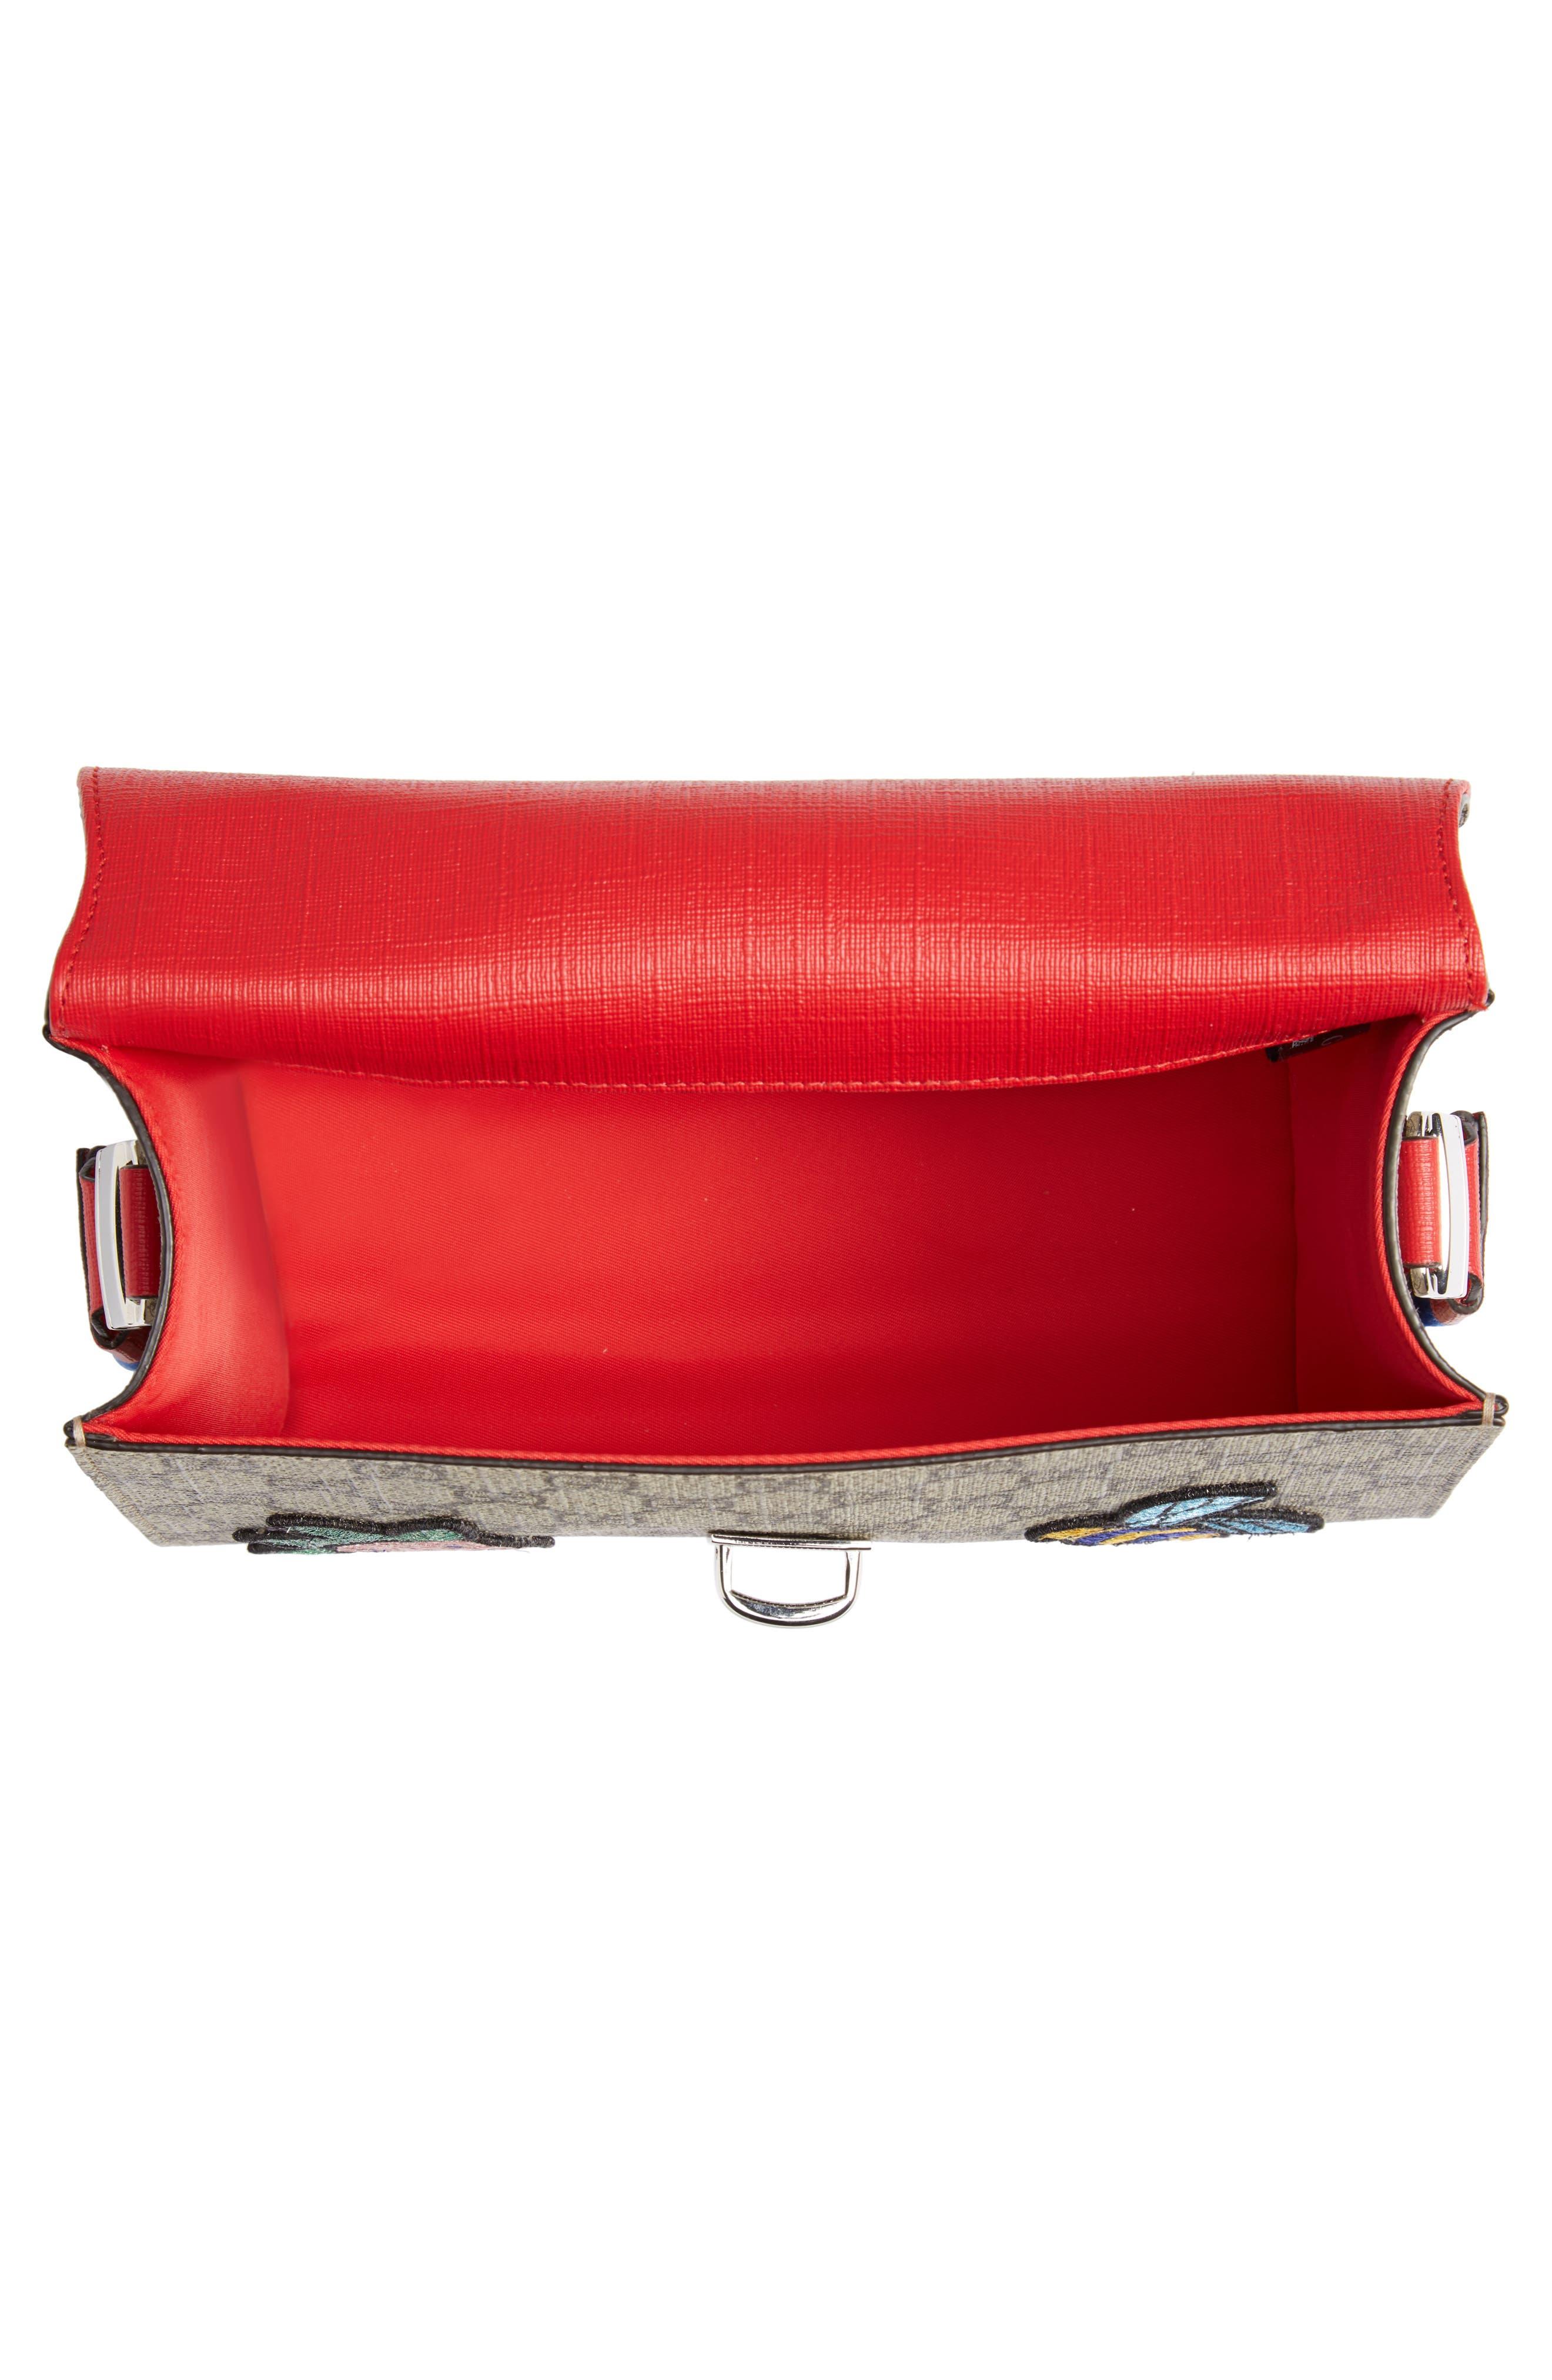 GUCCI,                             Junior GG Supreme Canvas Top Handle Bag,                             Alternate thumbnail 3, color,                             NERO/ VRV